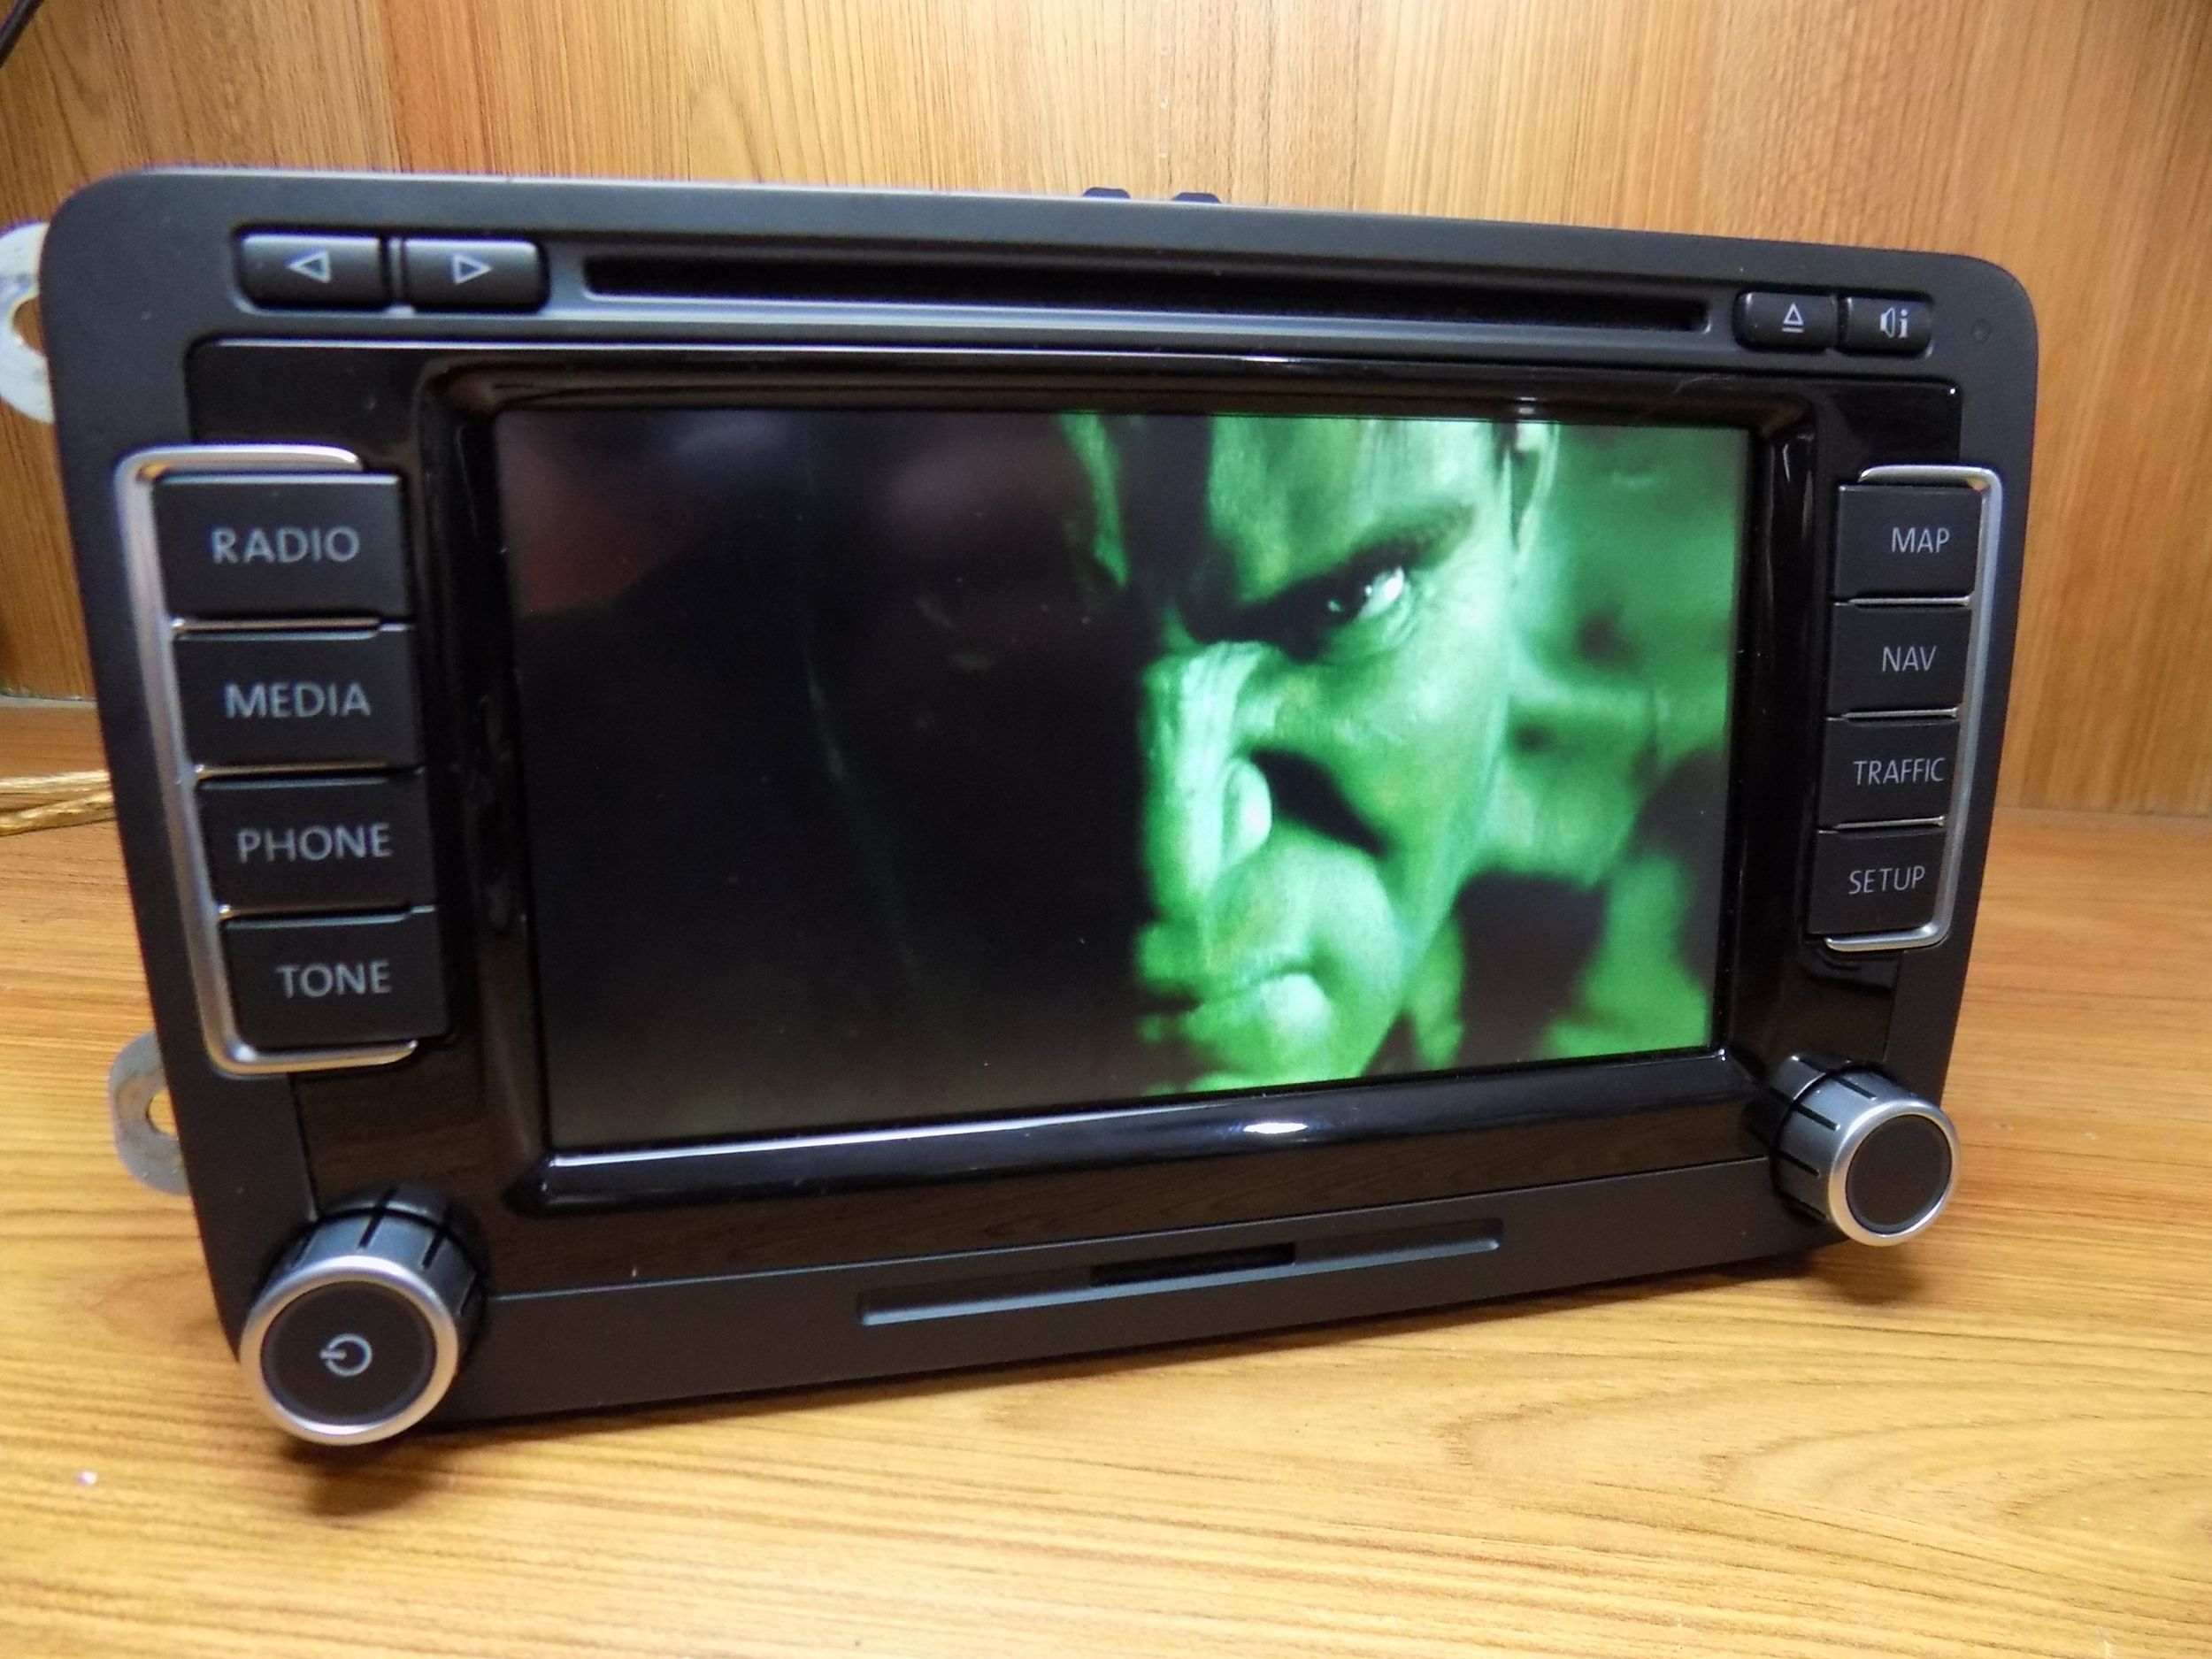 polovni vw rns 510 fabricka navigacija dvd mp3 cd sd golf. Black Bedroom Furniture Sets. Home Design Ideas